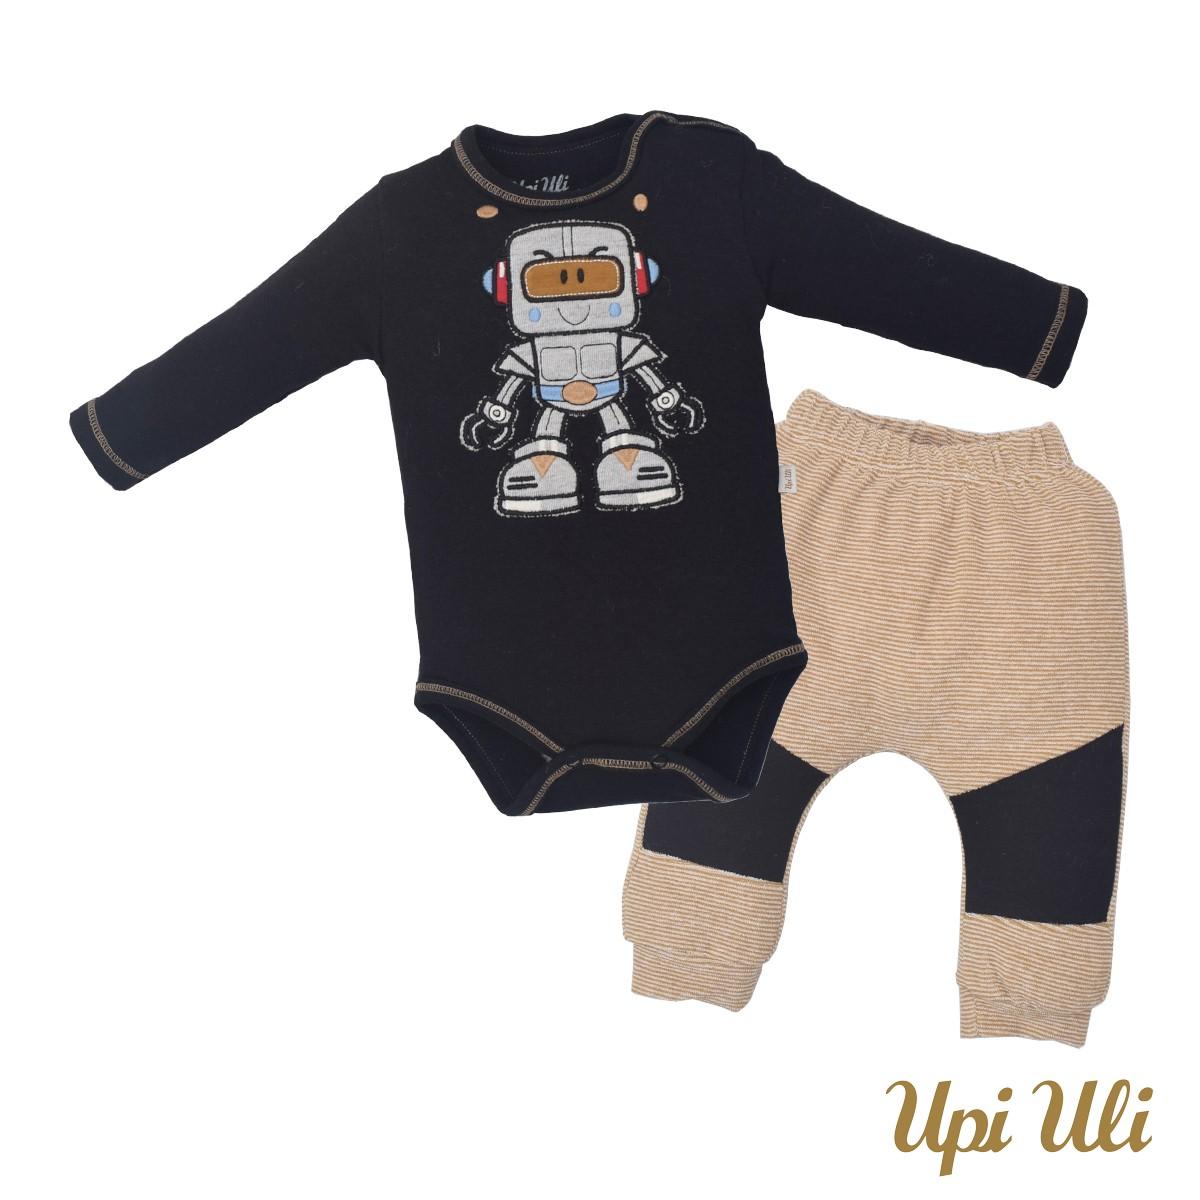 Conjunto de bebê Body C/ Culote  Soft Comfort/ Plush Caue O/I